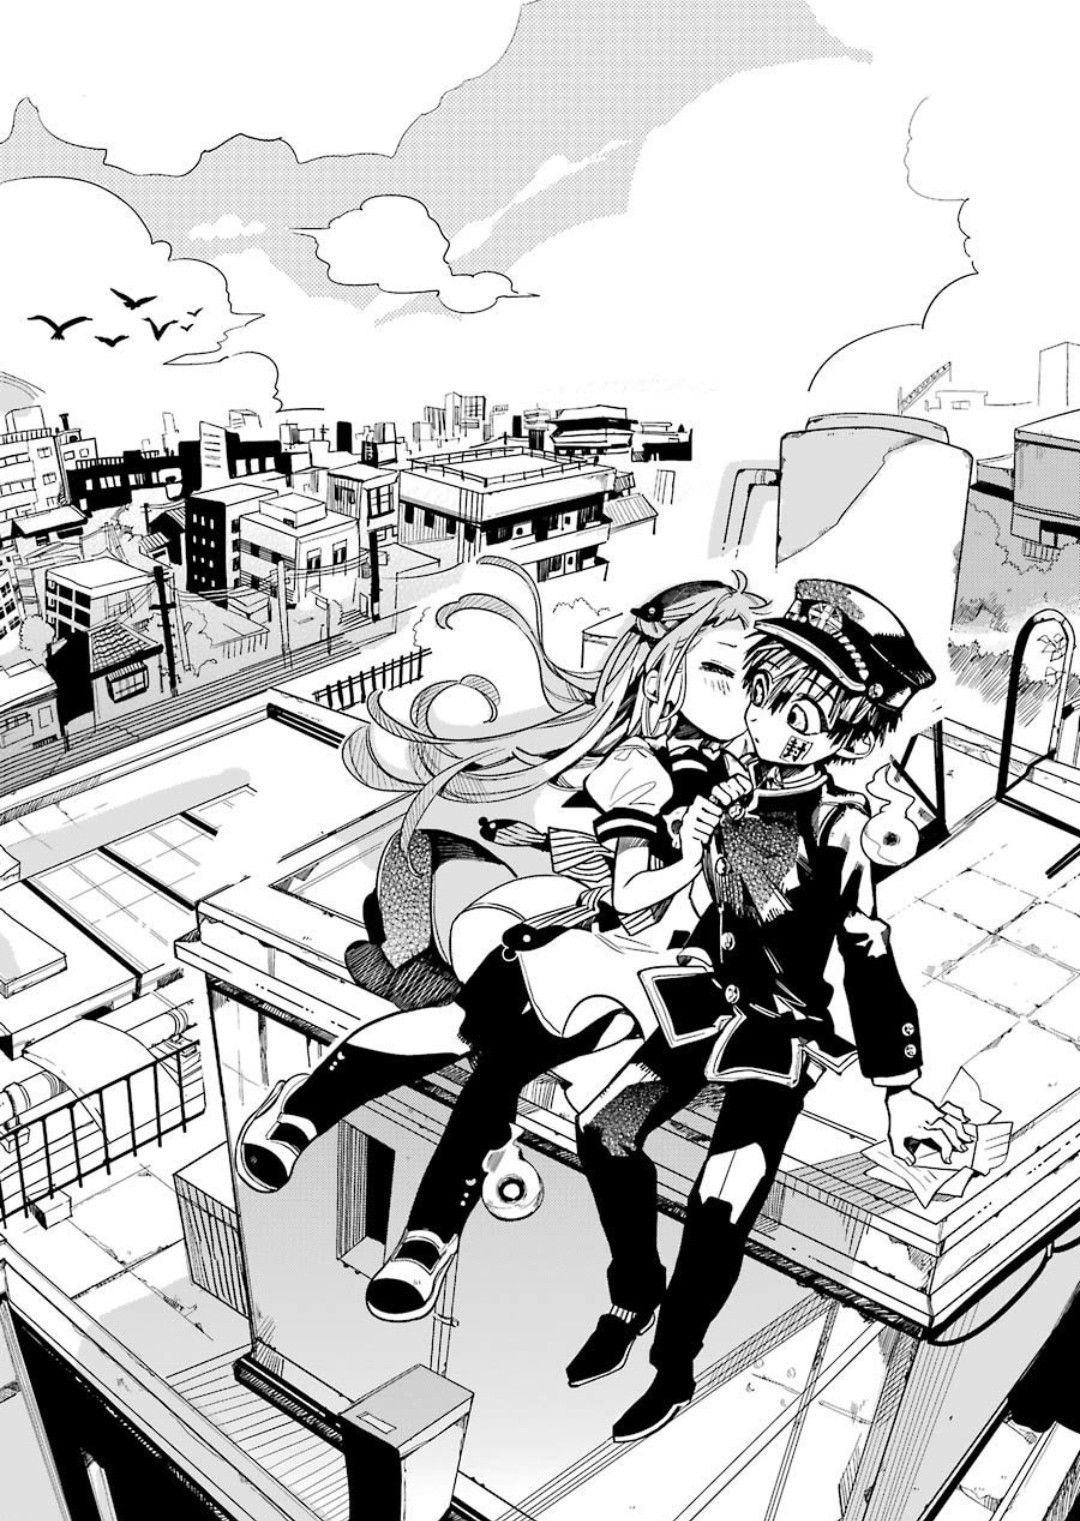 Pin by Yis Bar on Hanako in 2020 Hanako, Manga rock, Manga